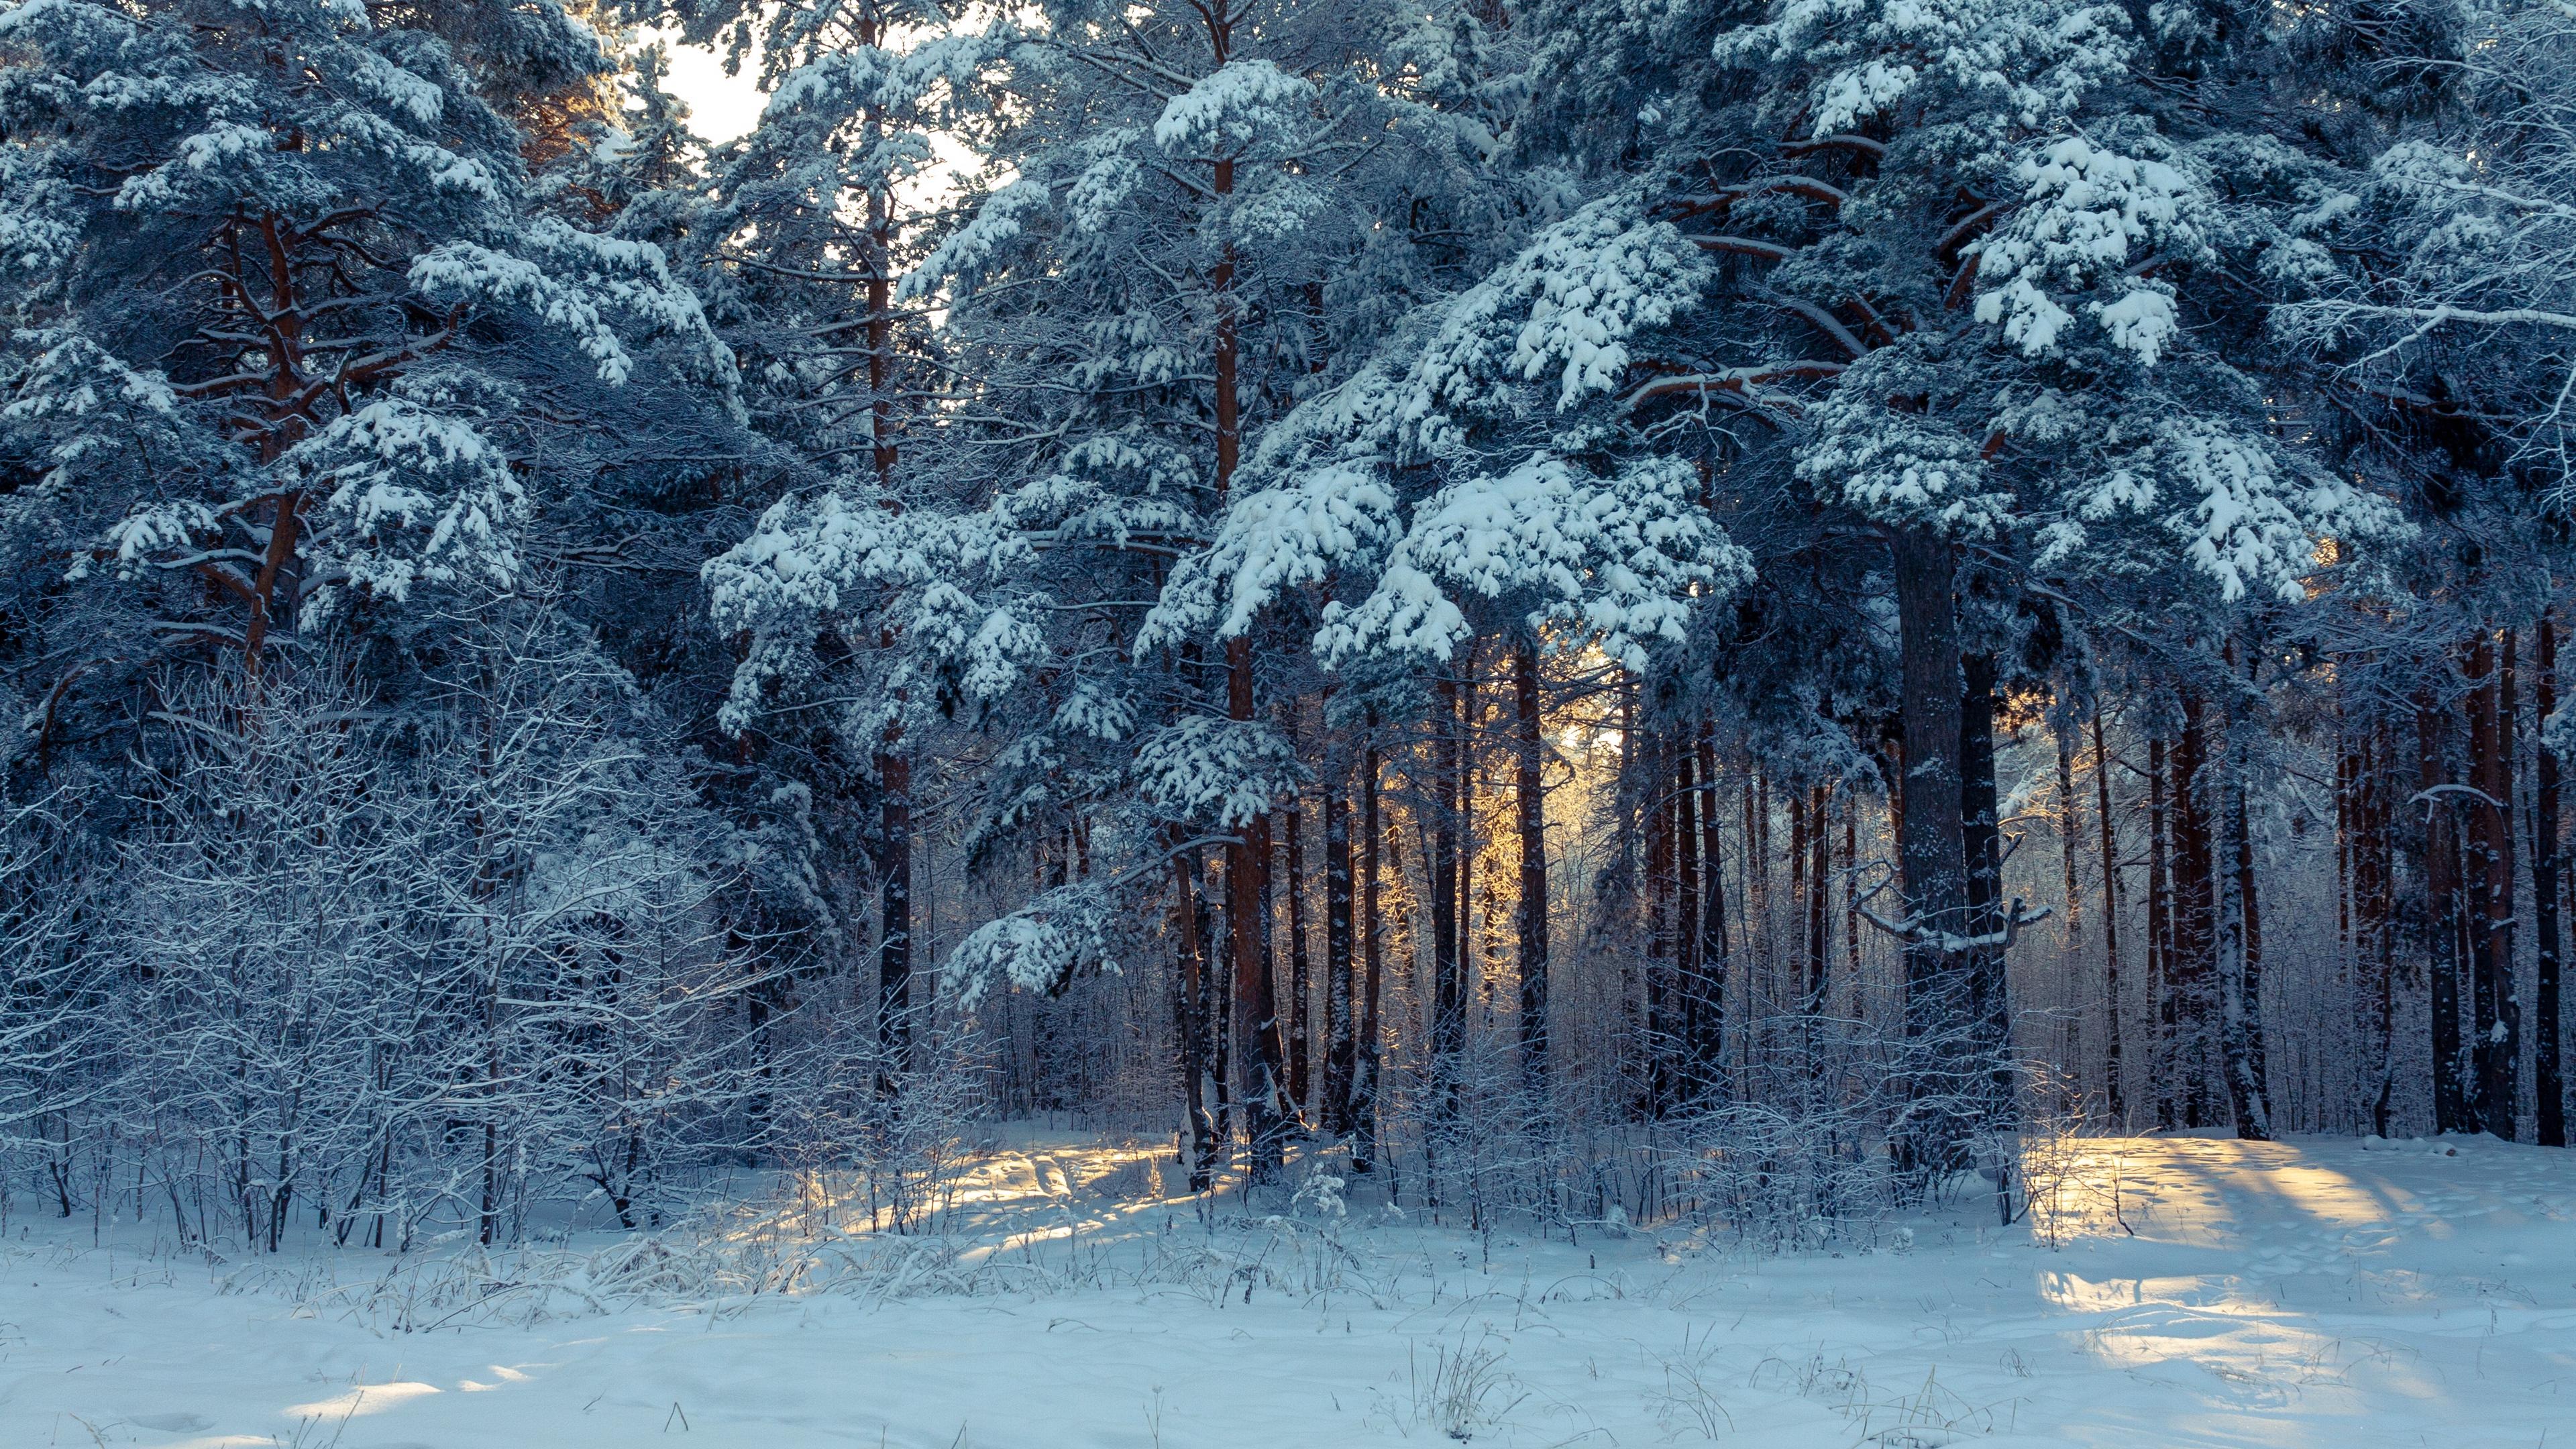 Wallpaper Forest, Winter, Snow, Trees, Winter Landscape - Winter Landscape Wallpaper 4k - HD Wallpaper